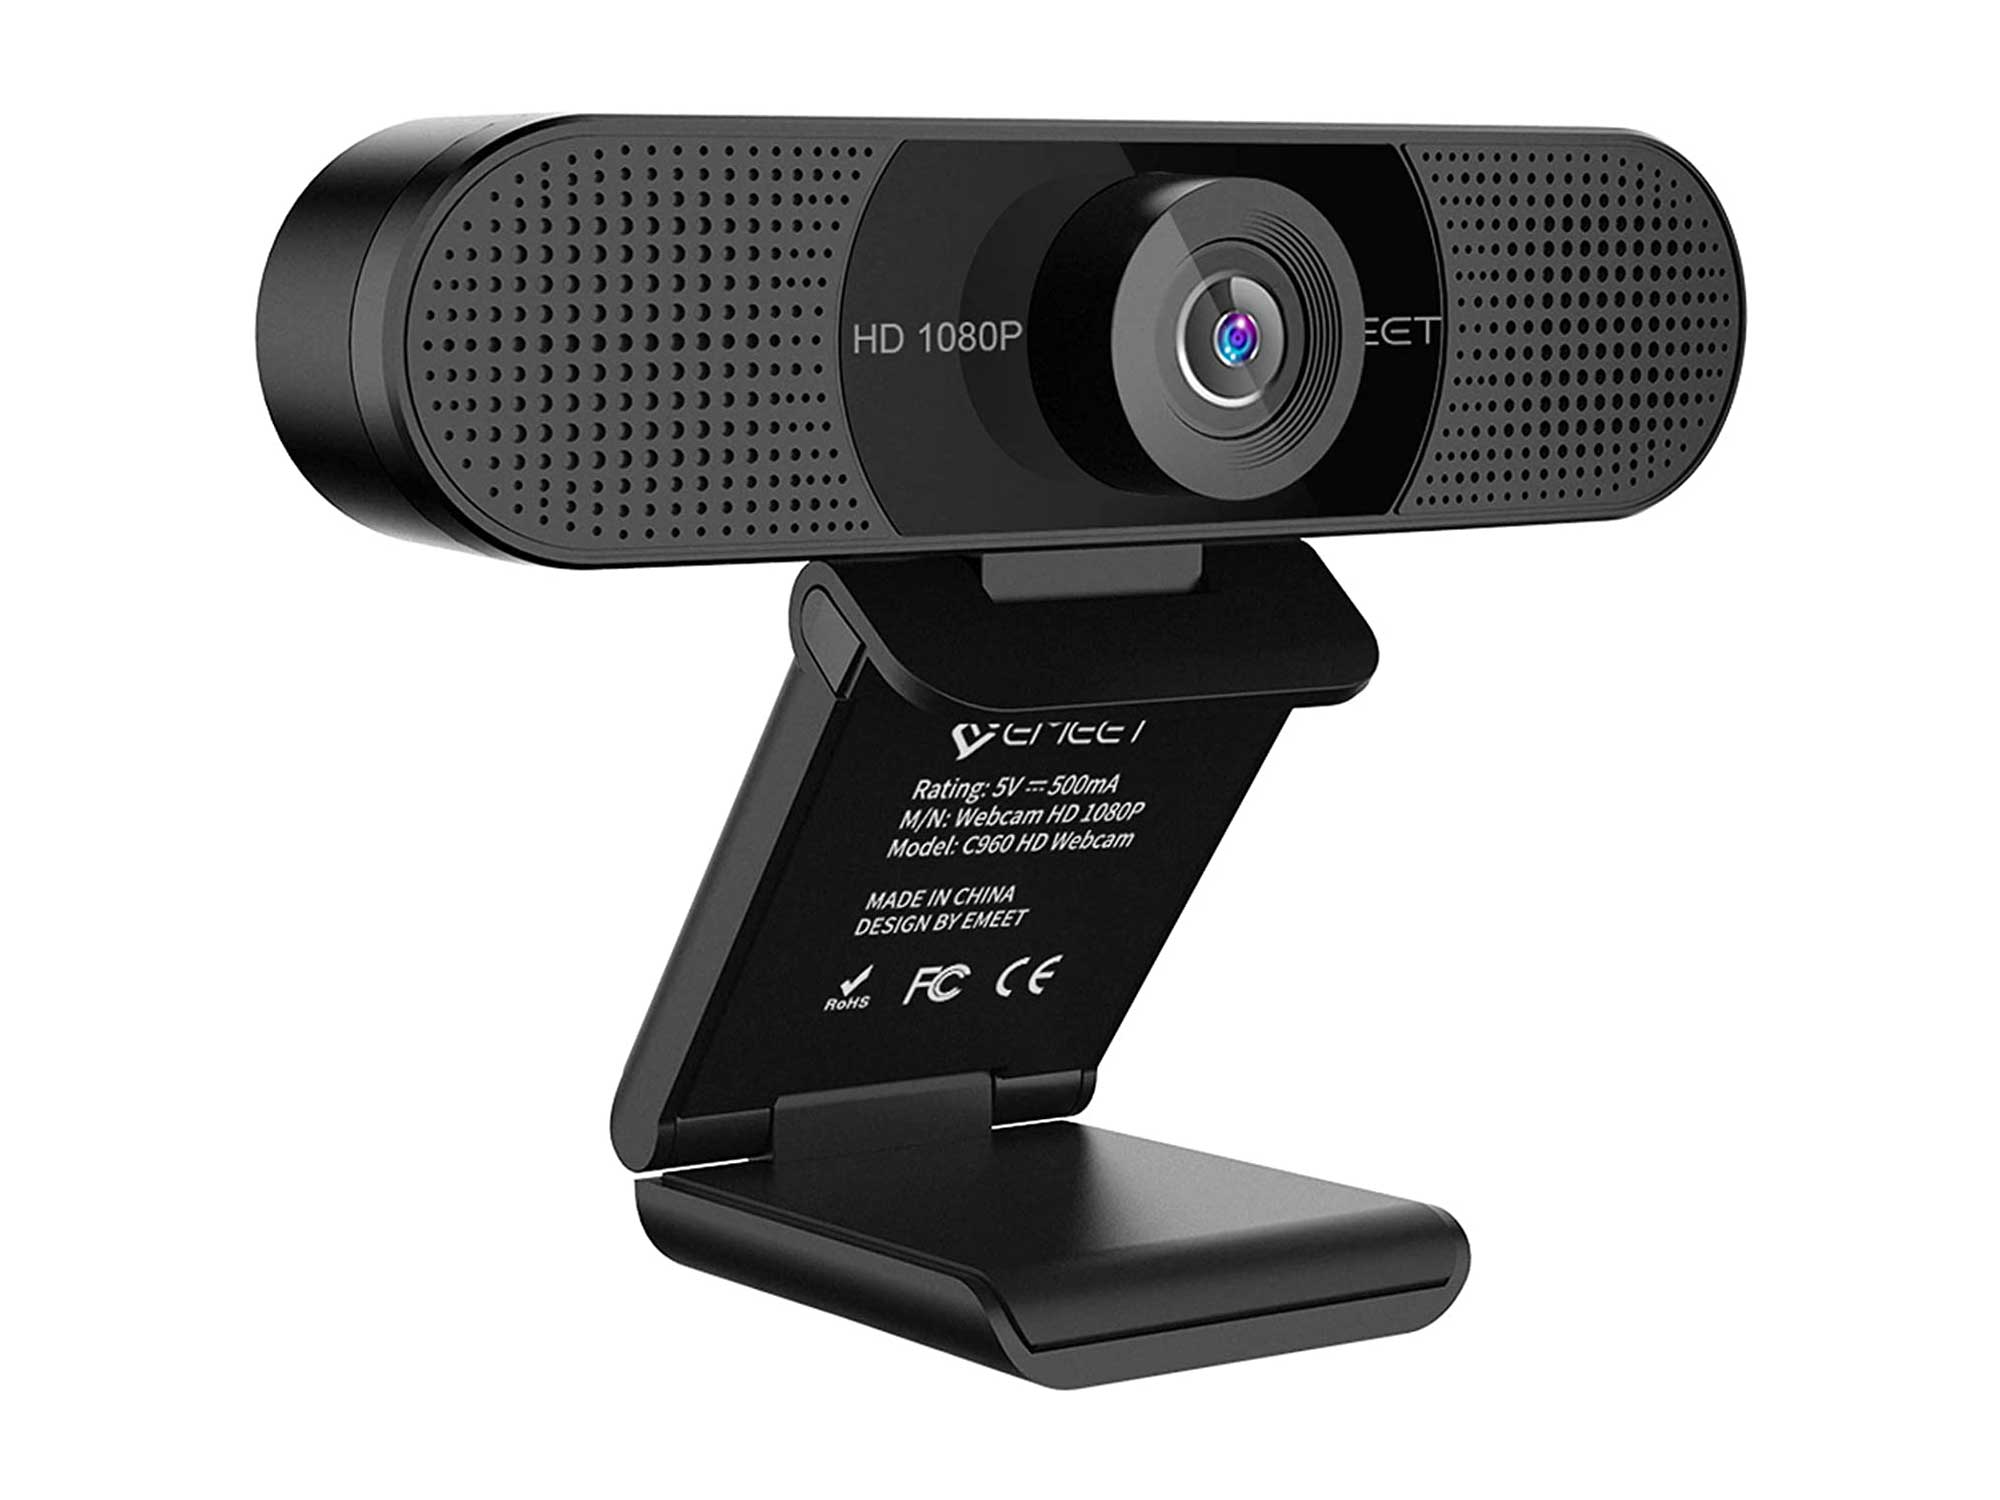 1080P Webcam with Microphone, C960 Web Camera, 2 Mics Streaming Webcam, 90°View Computer Camera, Plug and Play USB Webcam